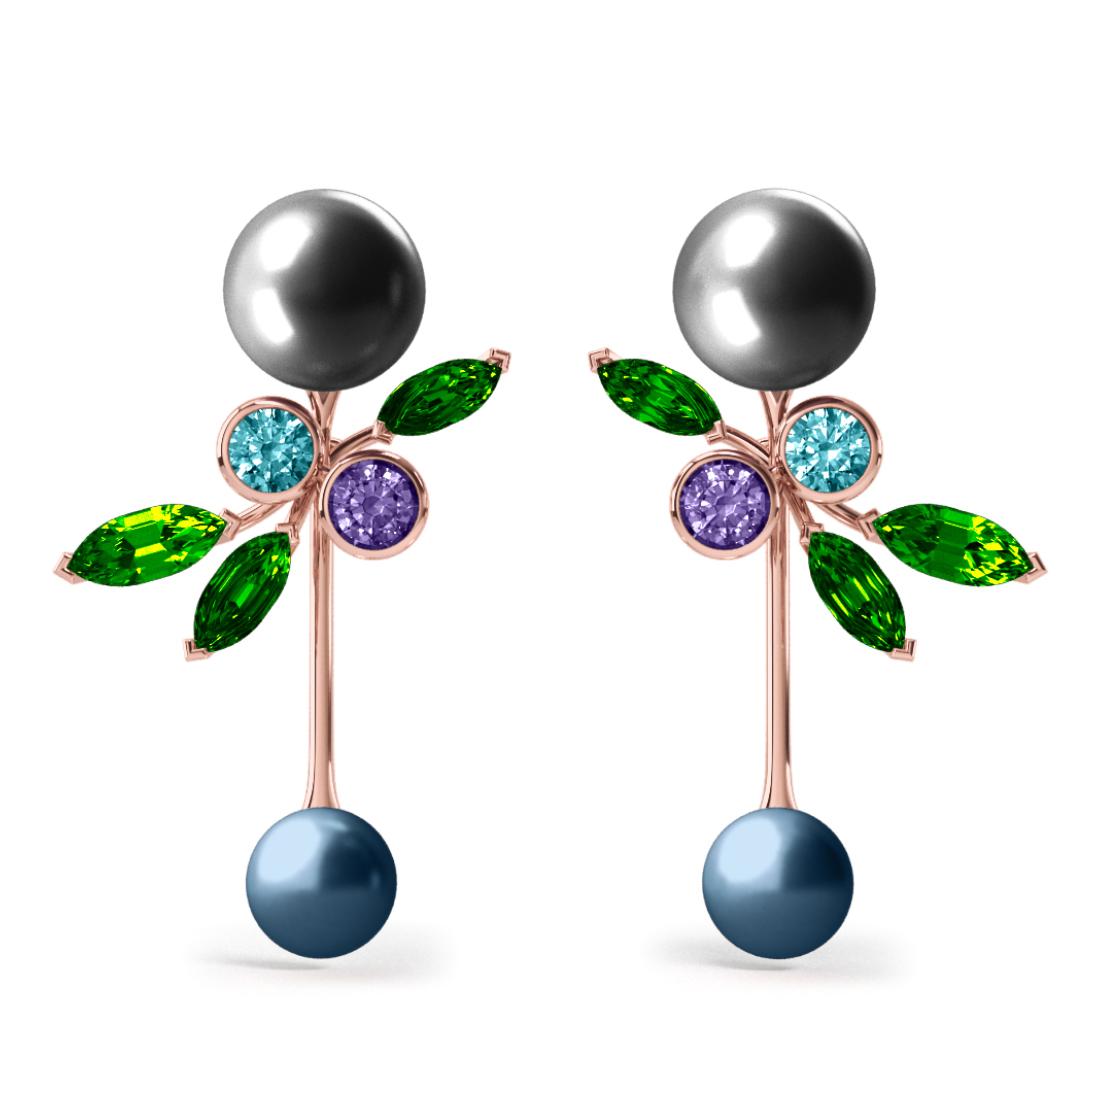 Boucles d'oreilles Pearly Angel Grise & Bleu - Saphirs, diamants, tsavorites & perles de Tahiti <br /> Or blanc 18 carats